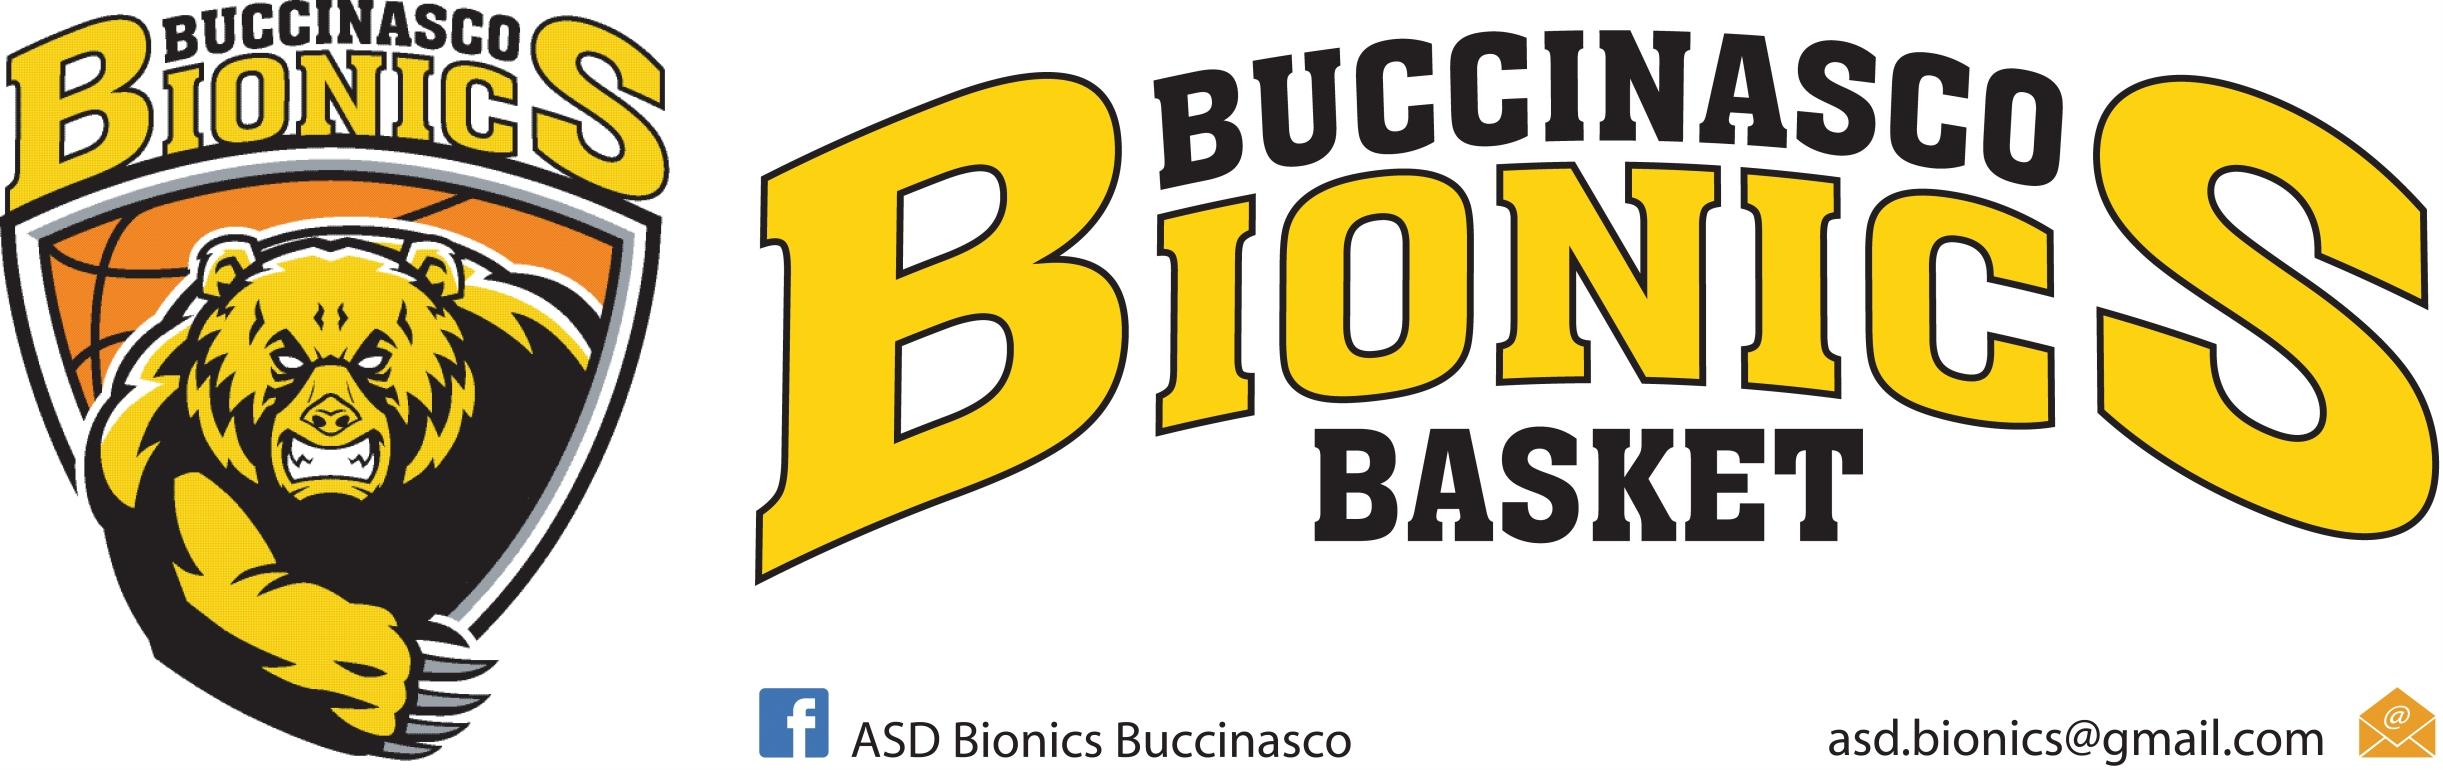 Bionics Basket Buccinasco